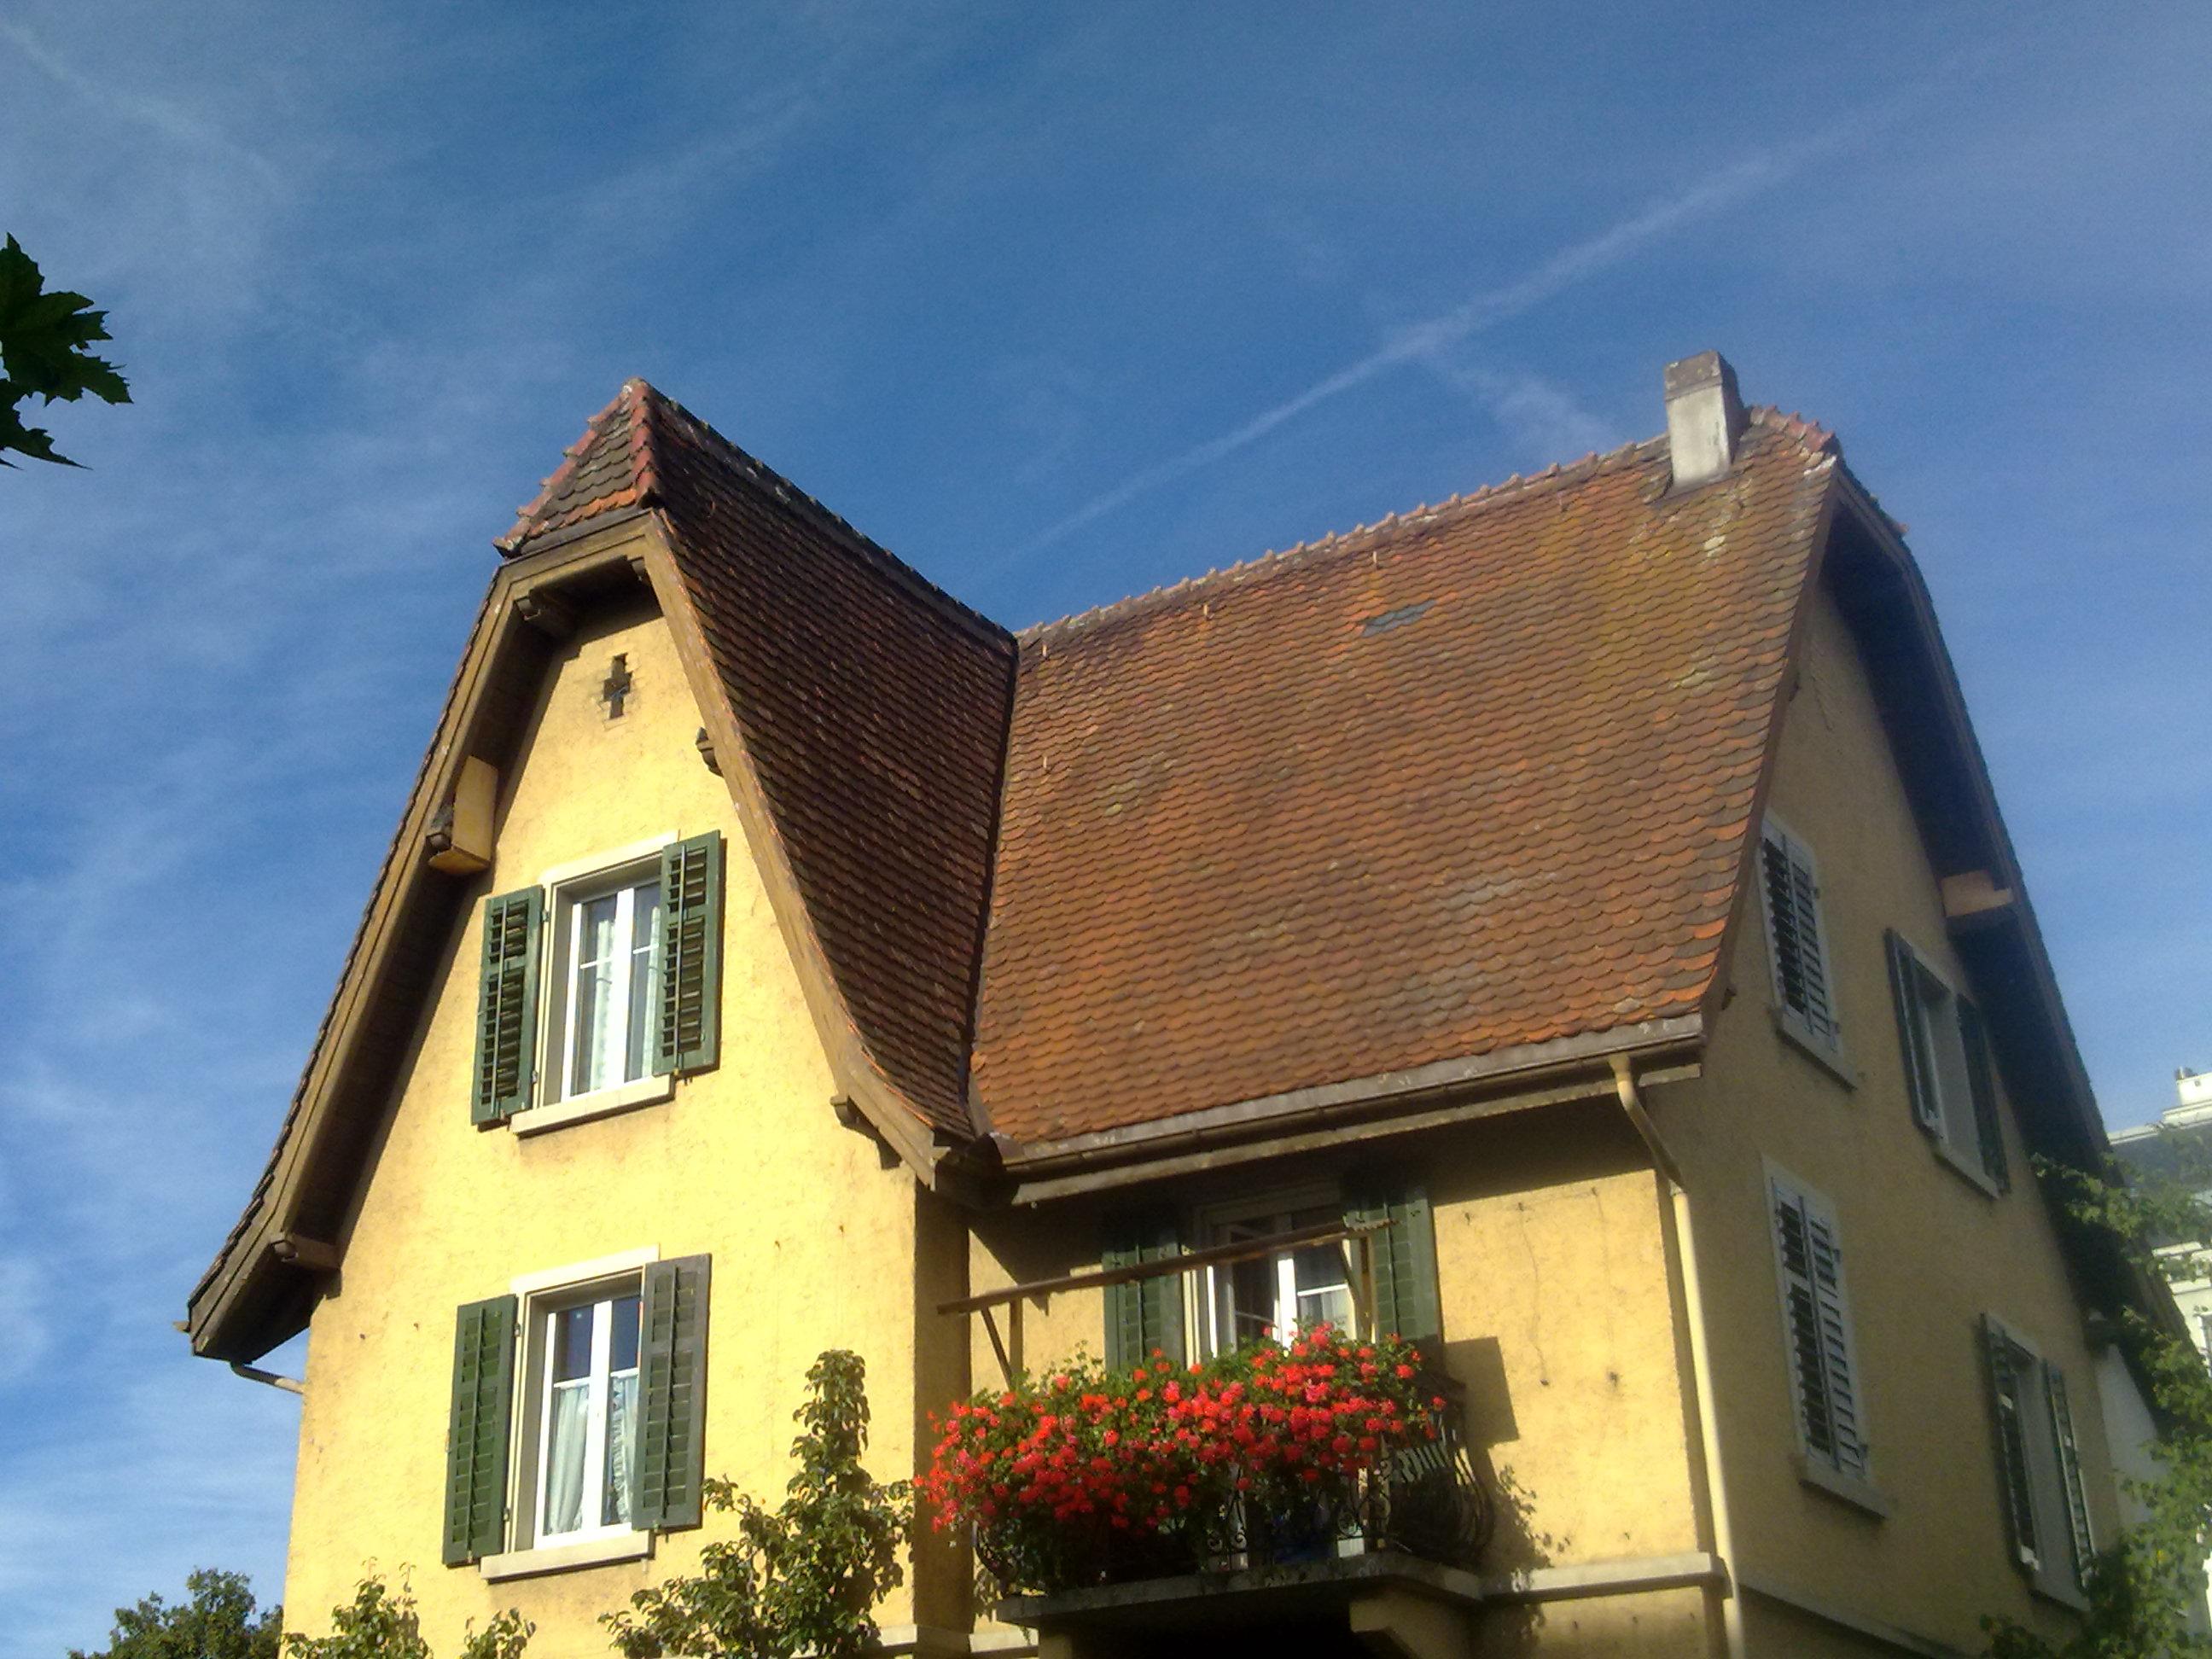 Mehrfamilienhaus - vorher